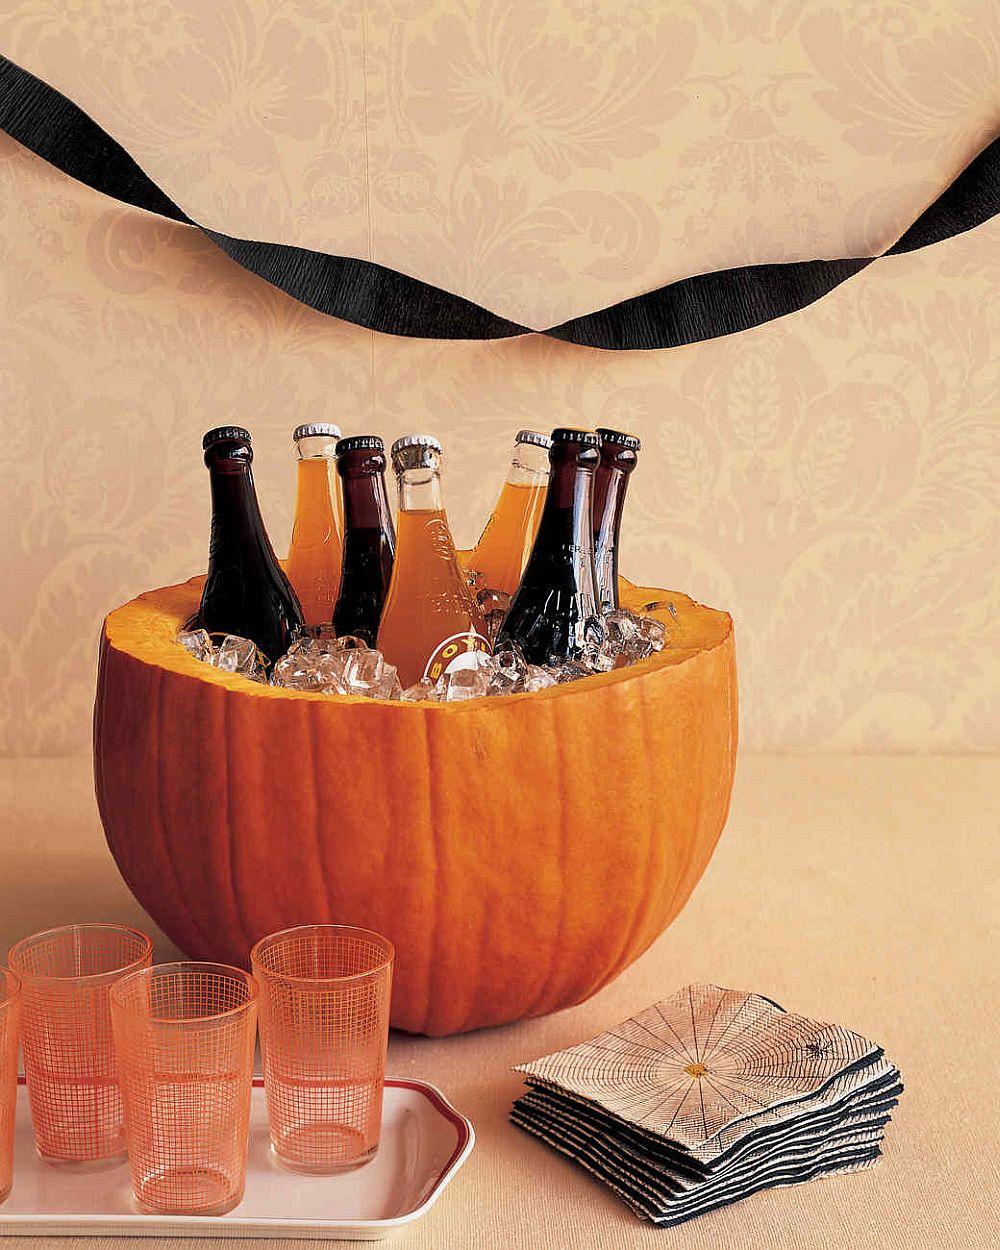 DIY pumpkin party cooler